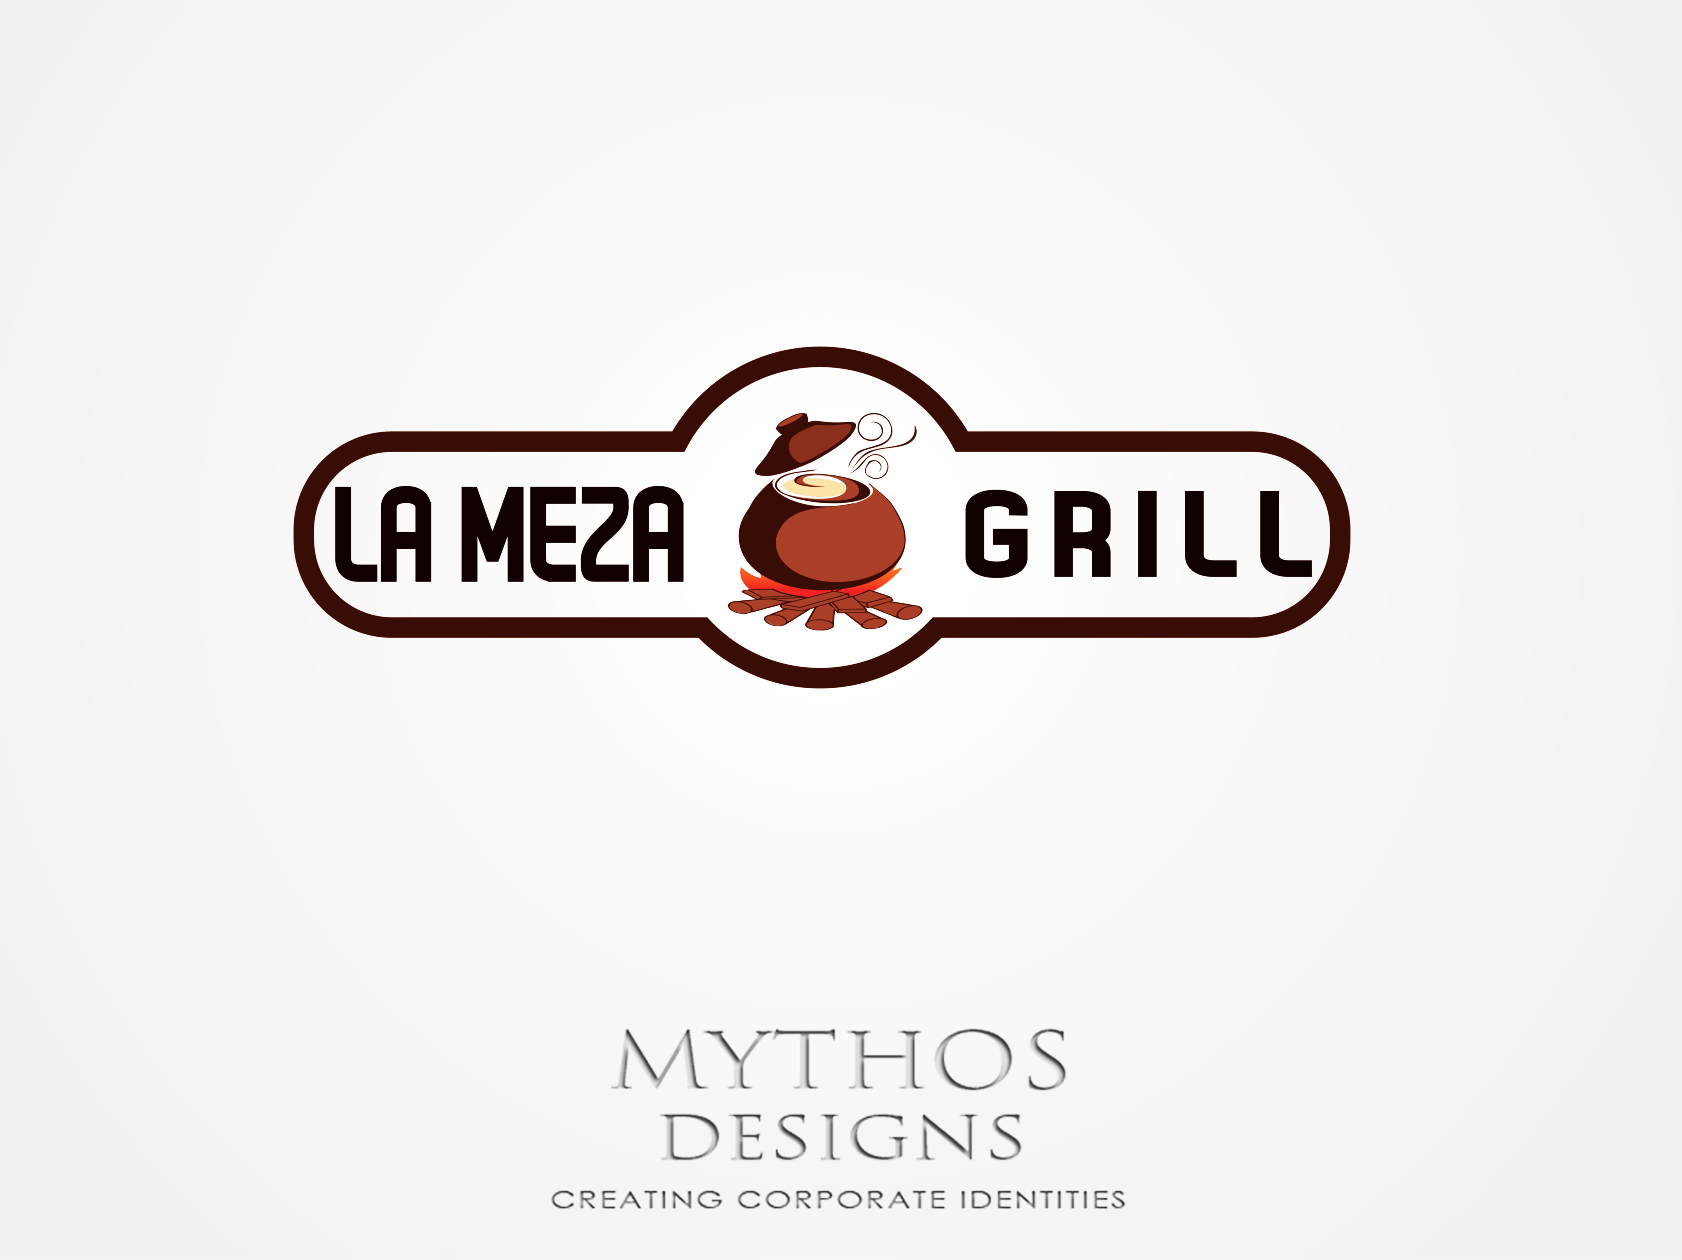 Logo Design by Mythos Designs - Entry No. 15 in the Logo Design Contest Inspiring Logo Design for La Meza Grill Ltd..